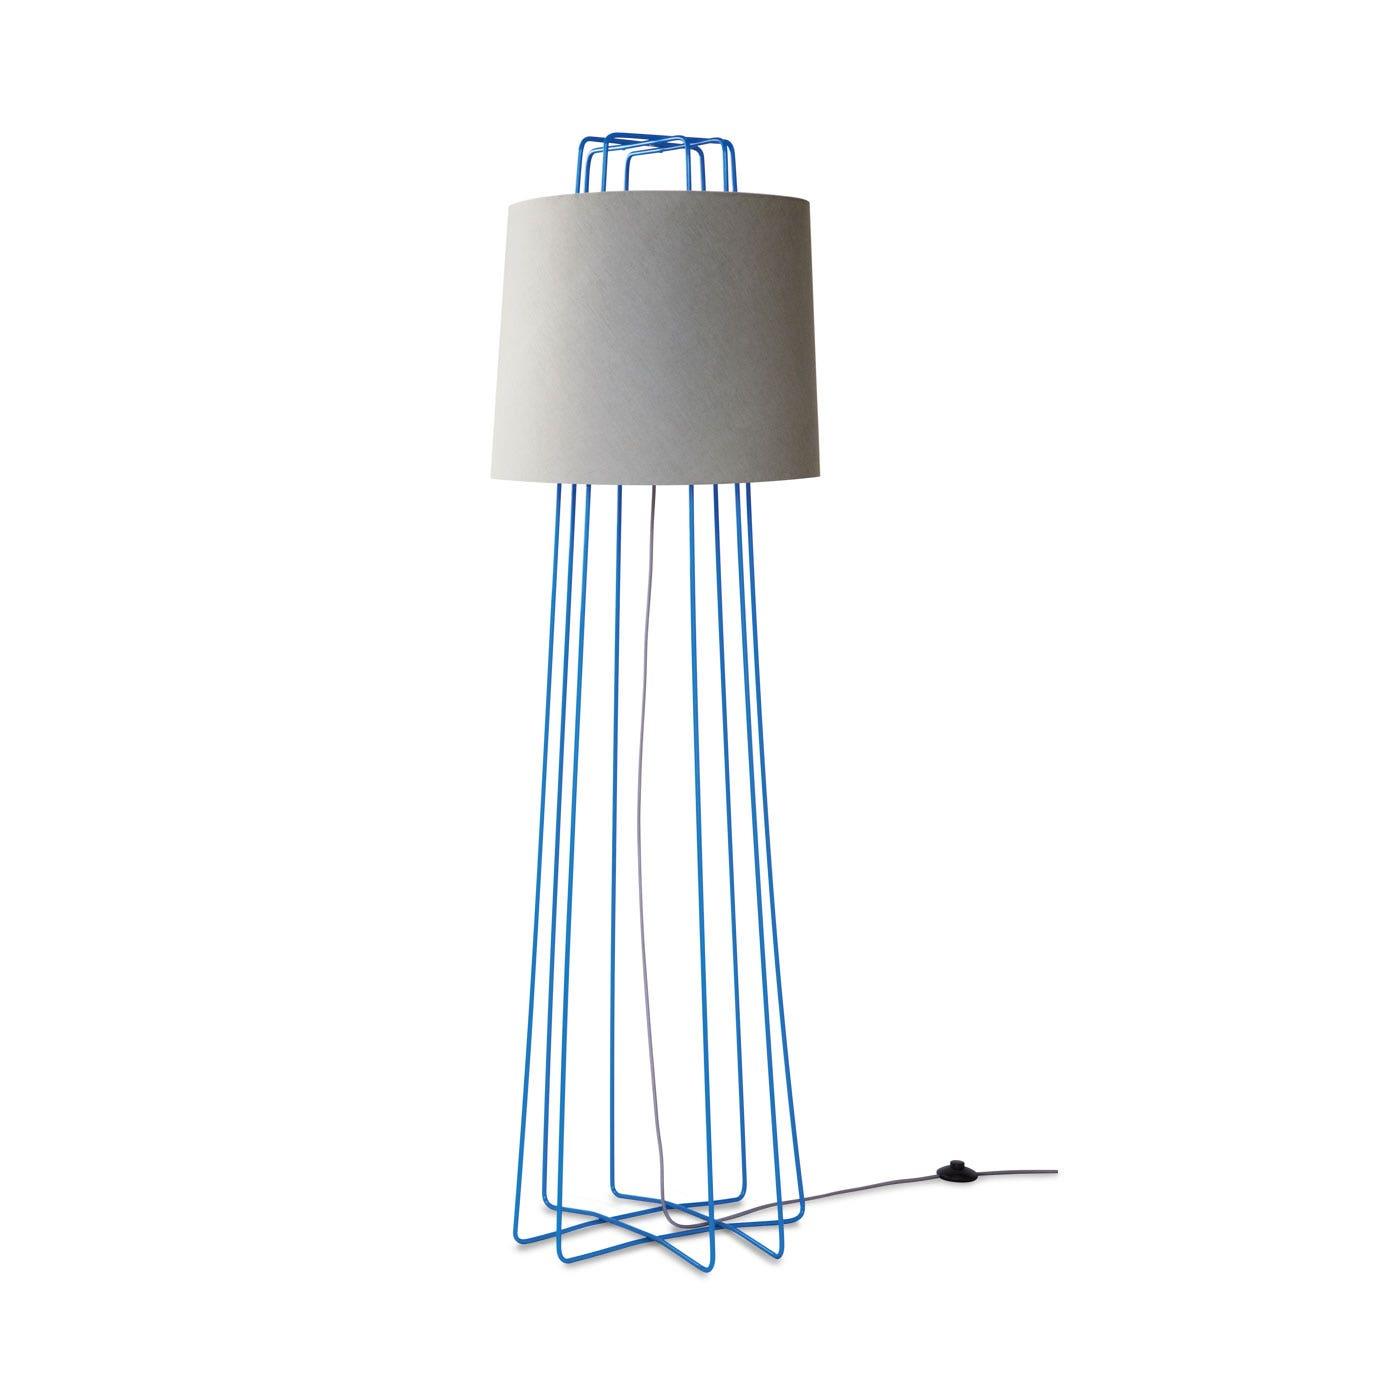 contemporary floor lighting. previous image perimeter floor lamp bright blue grey contemporary lighting